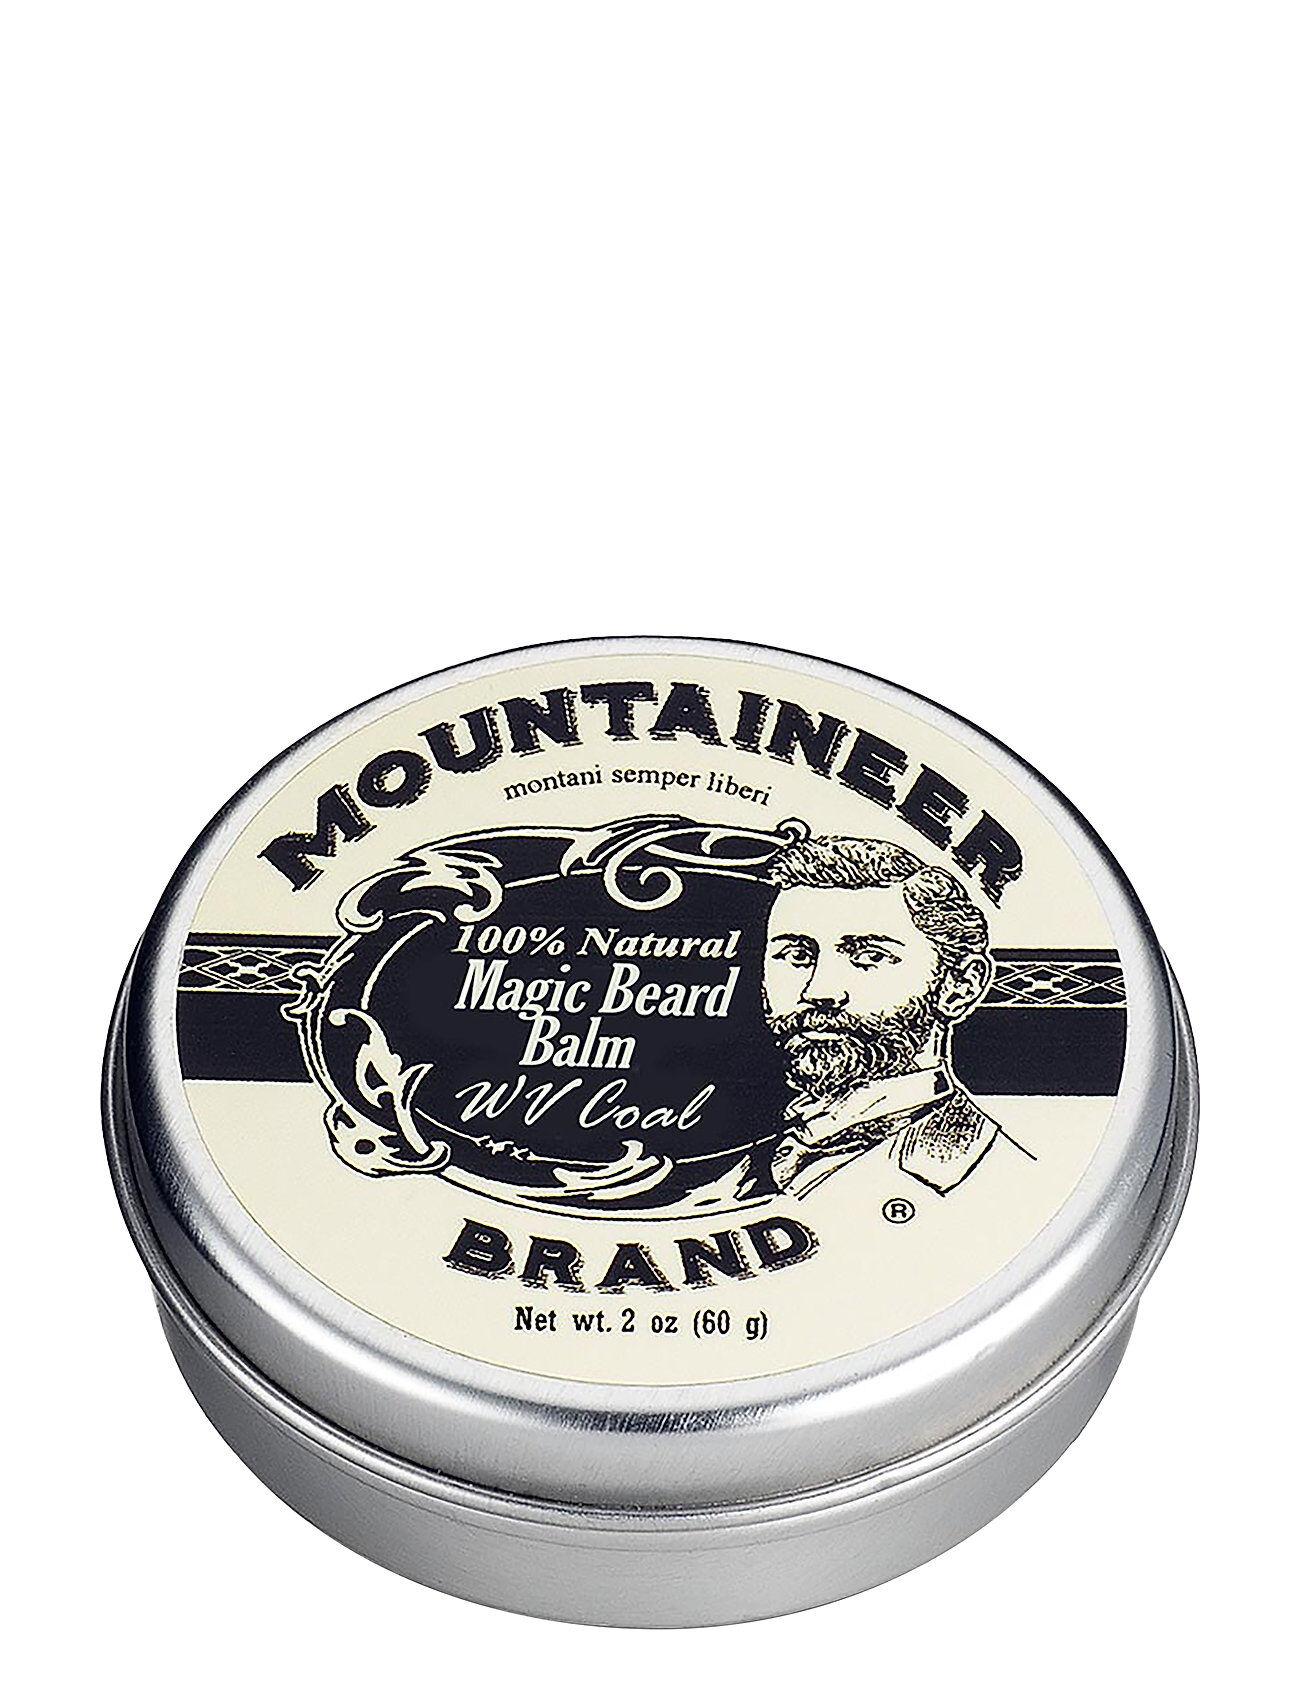 Mountaineer Brand Magic Coal Beard Balm Beauty MEN Shaving Products Beard & Mustache Nude Mountaineer Brand